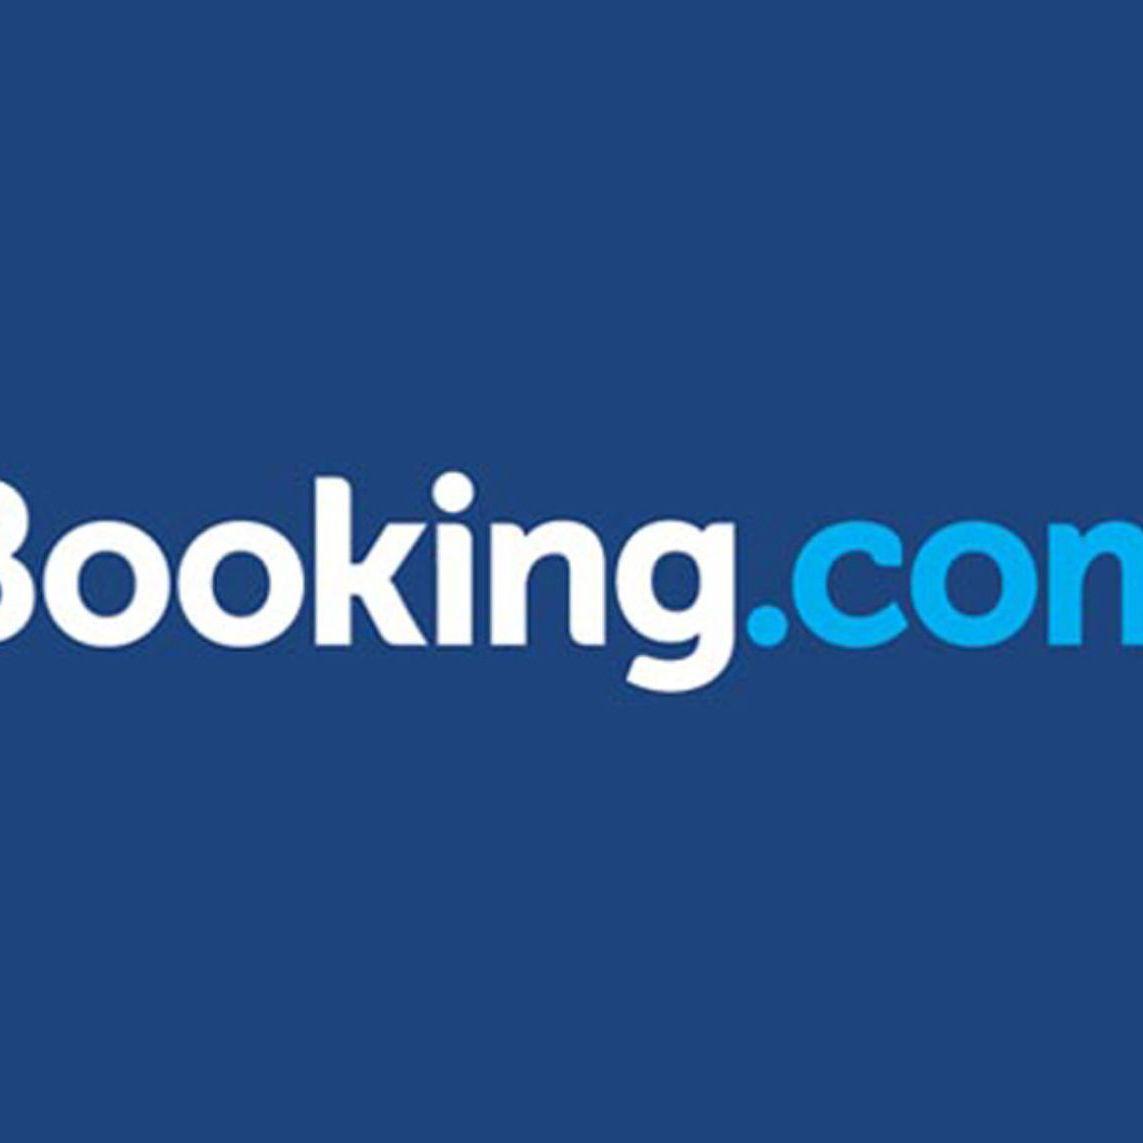 The 8 Best Online Travel Agencies of 2020